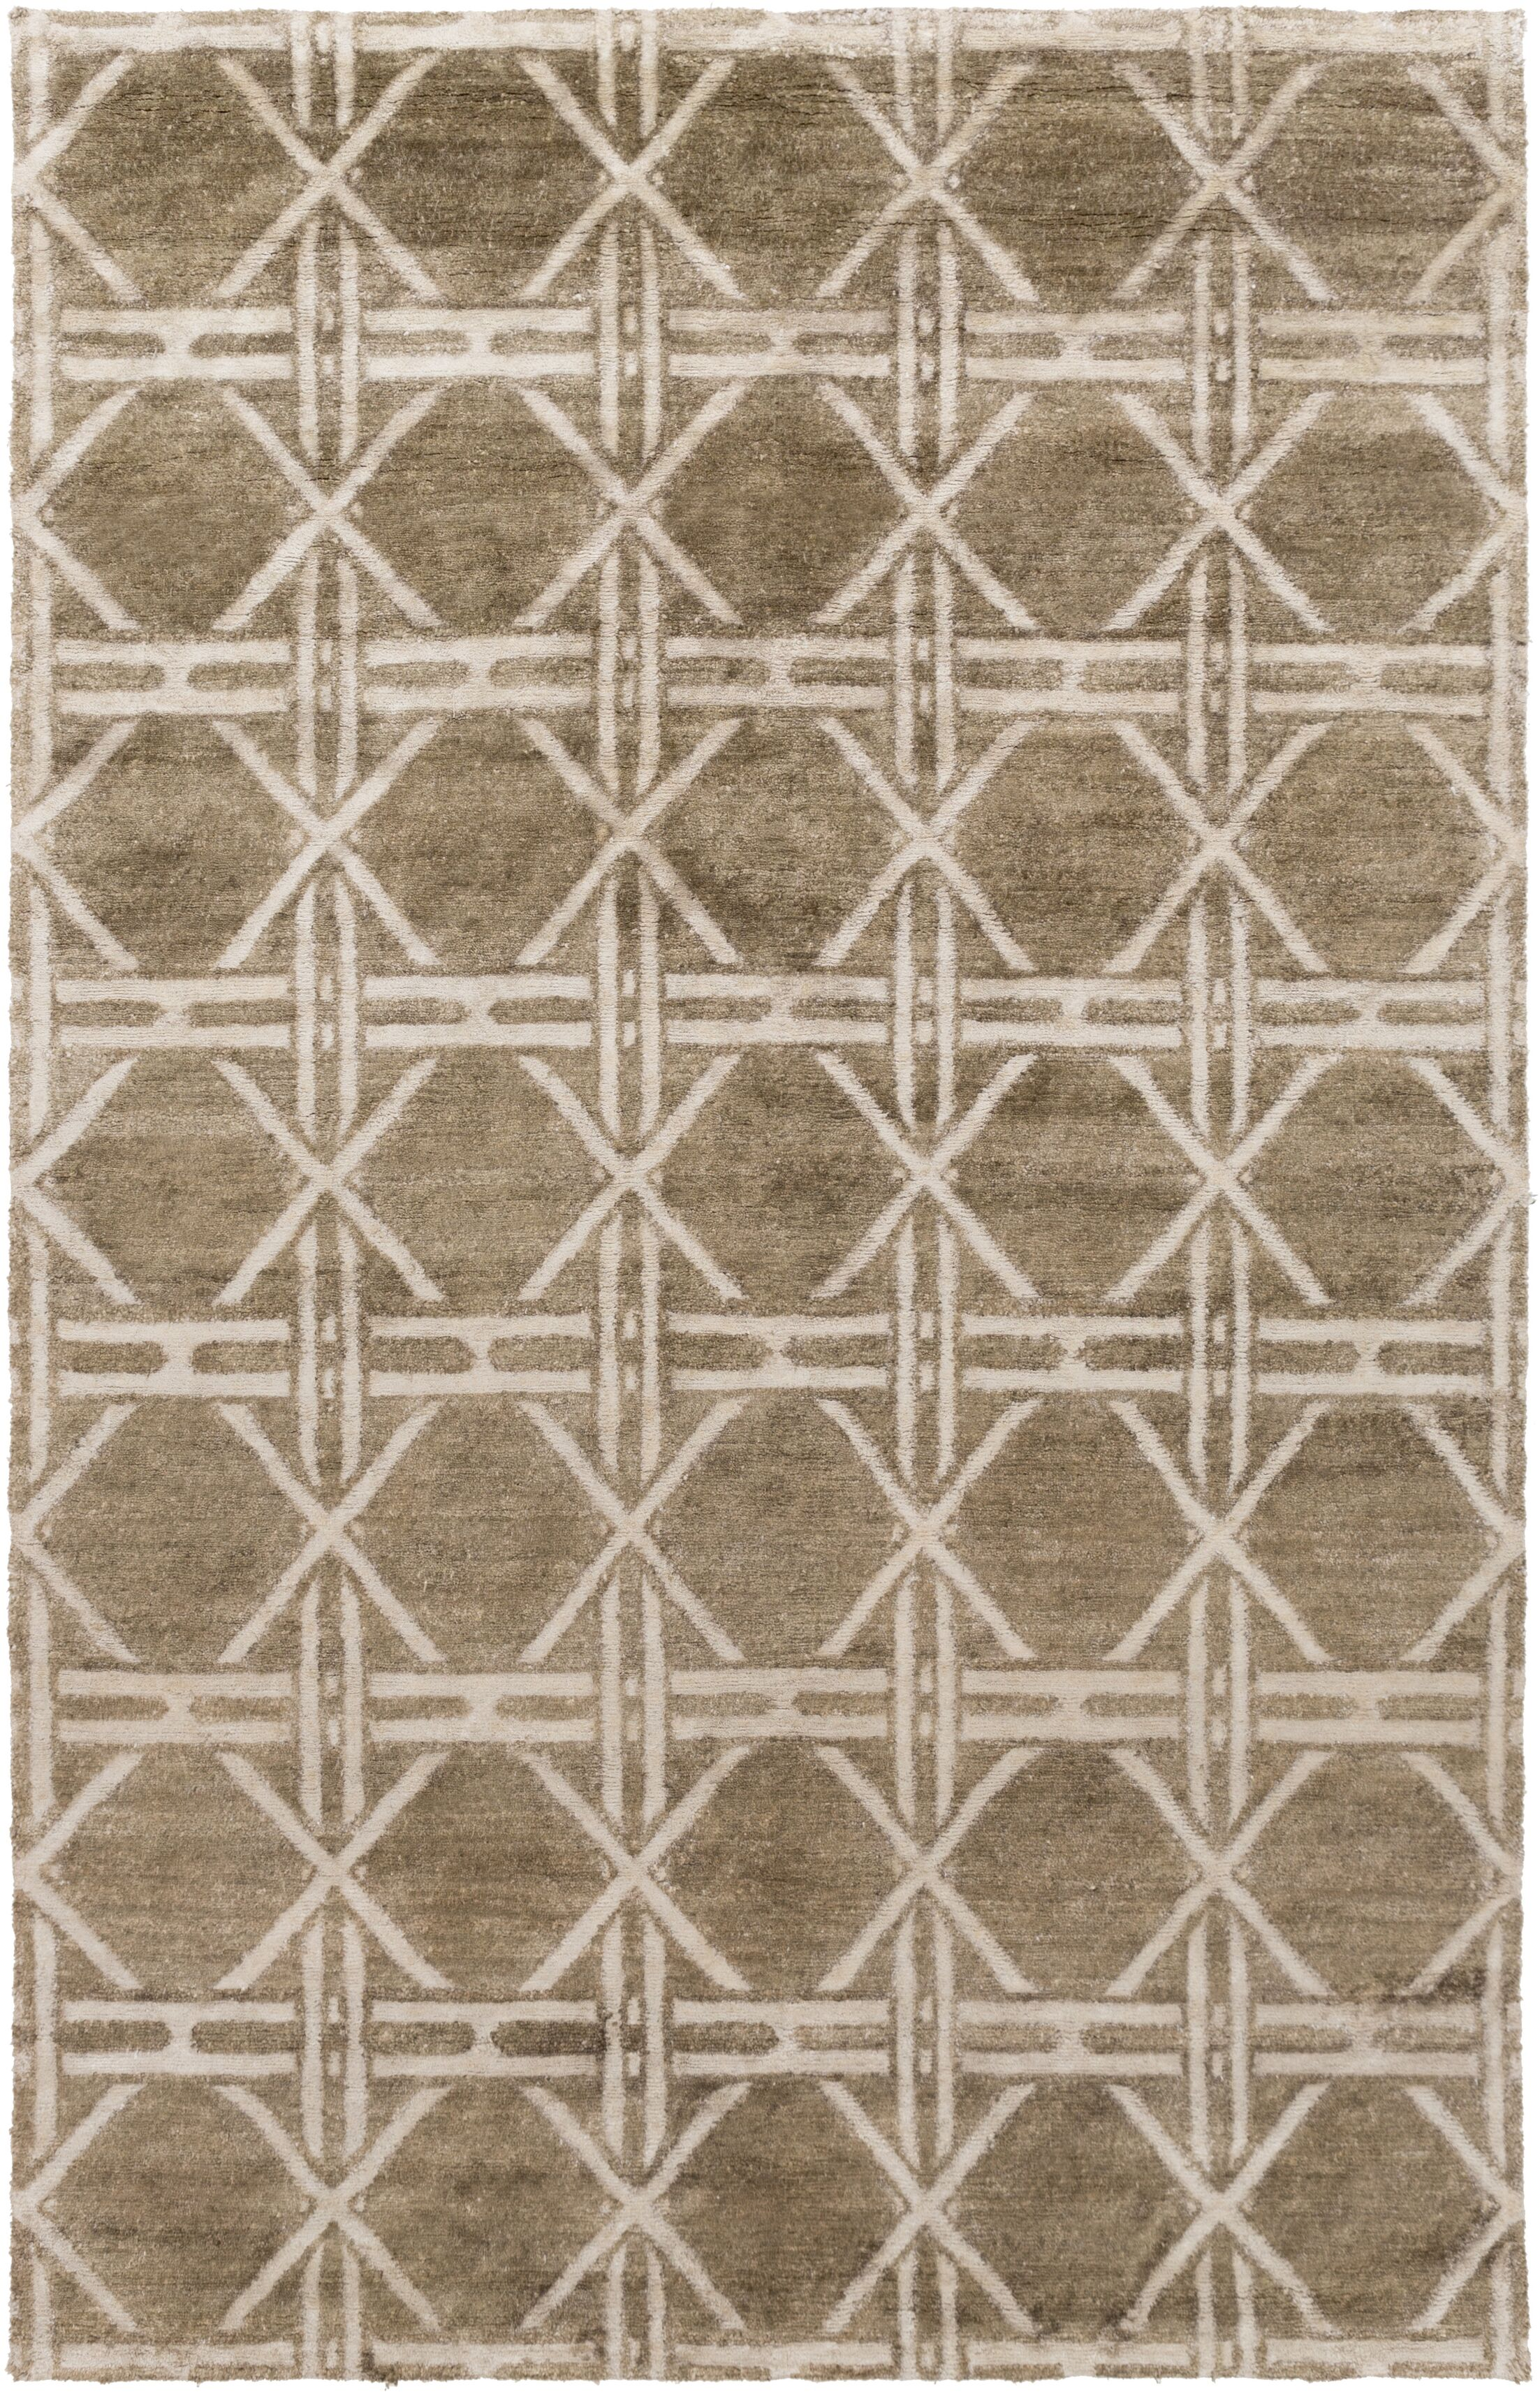 Terrance Olive Geometric Area Rug Rug Size: Rectangle 2' x 3'